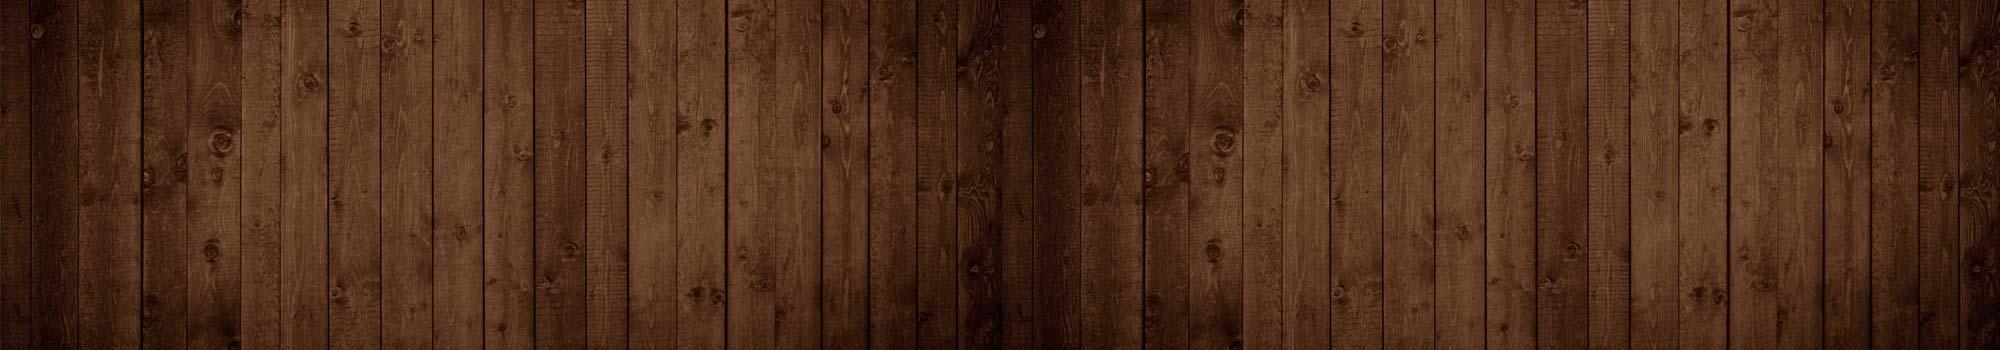 new_woodbackground